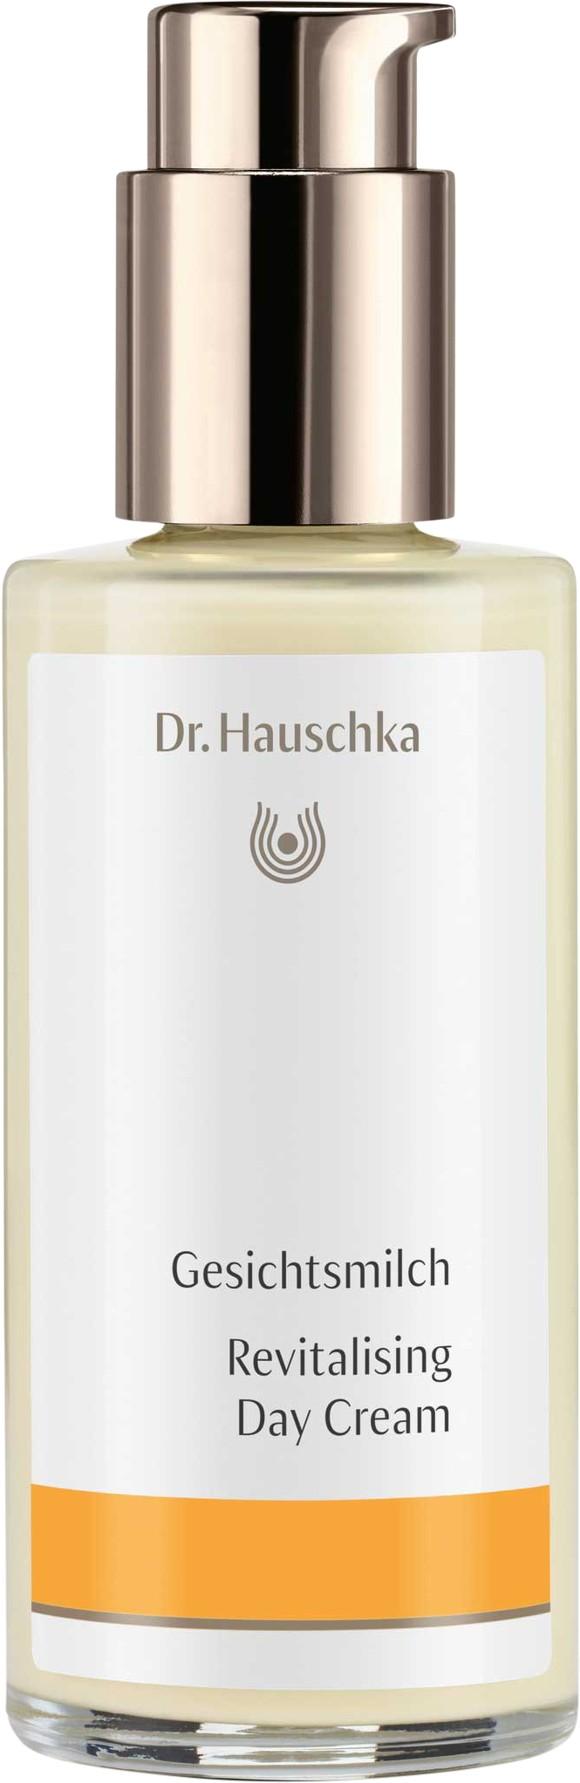 Dr. Hauschka - Revitalising Dagcreme 100 ml